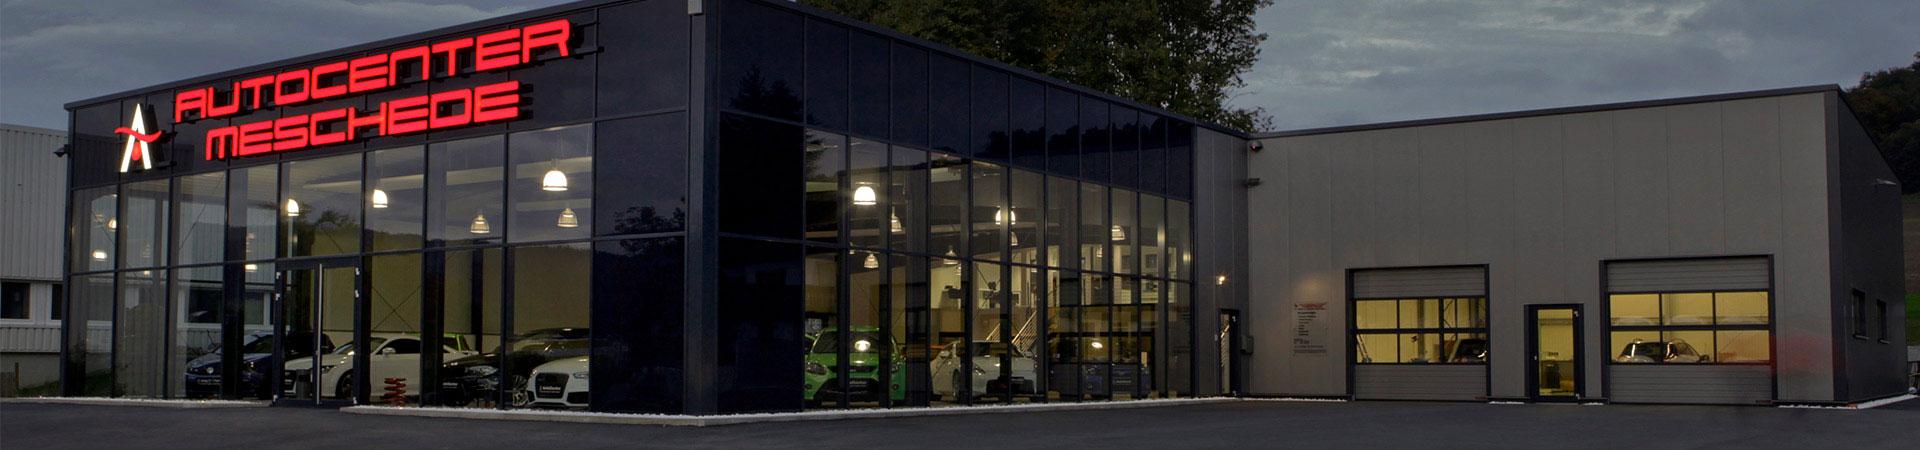 autocenter-meschede1